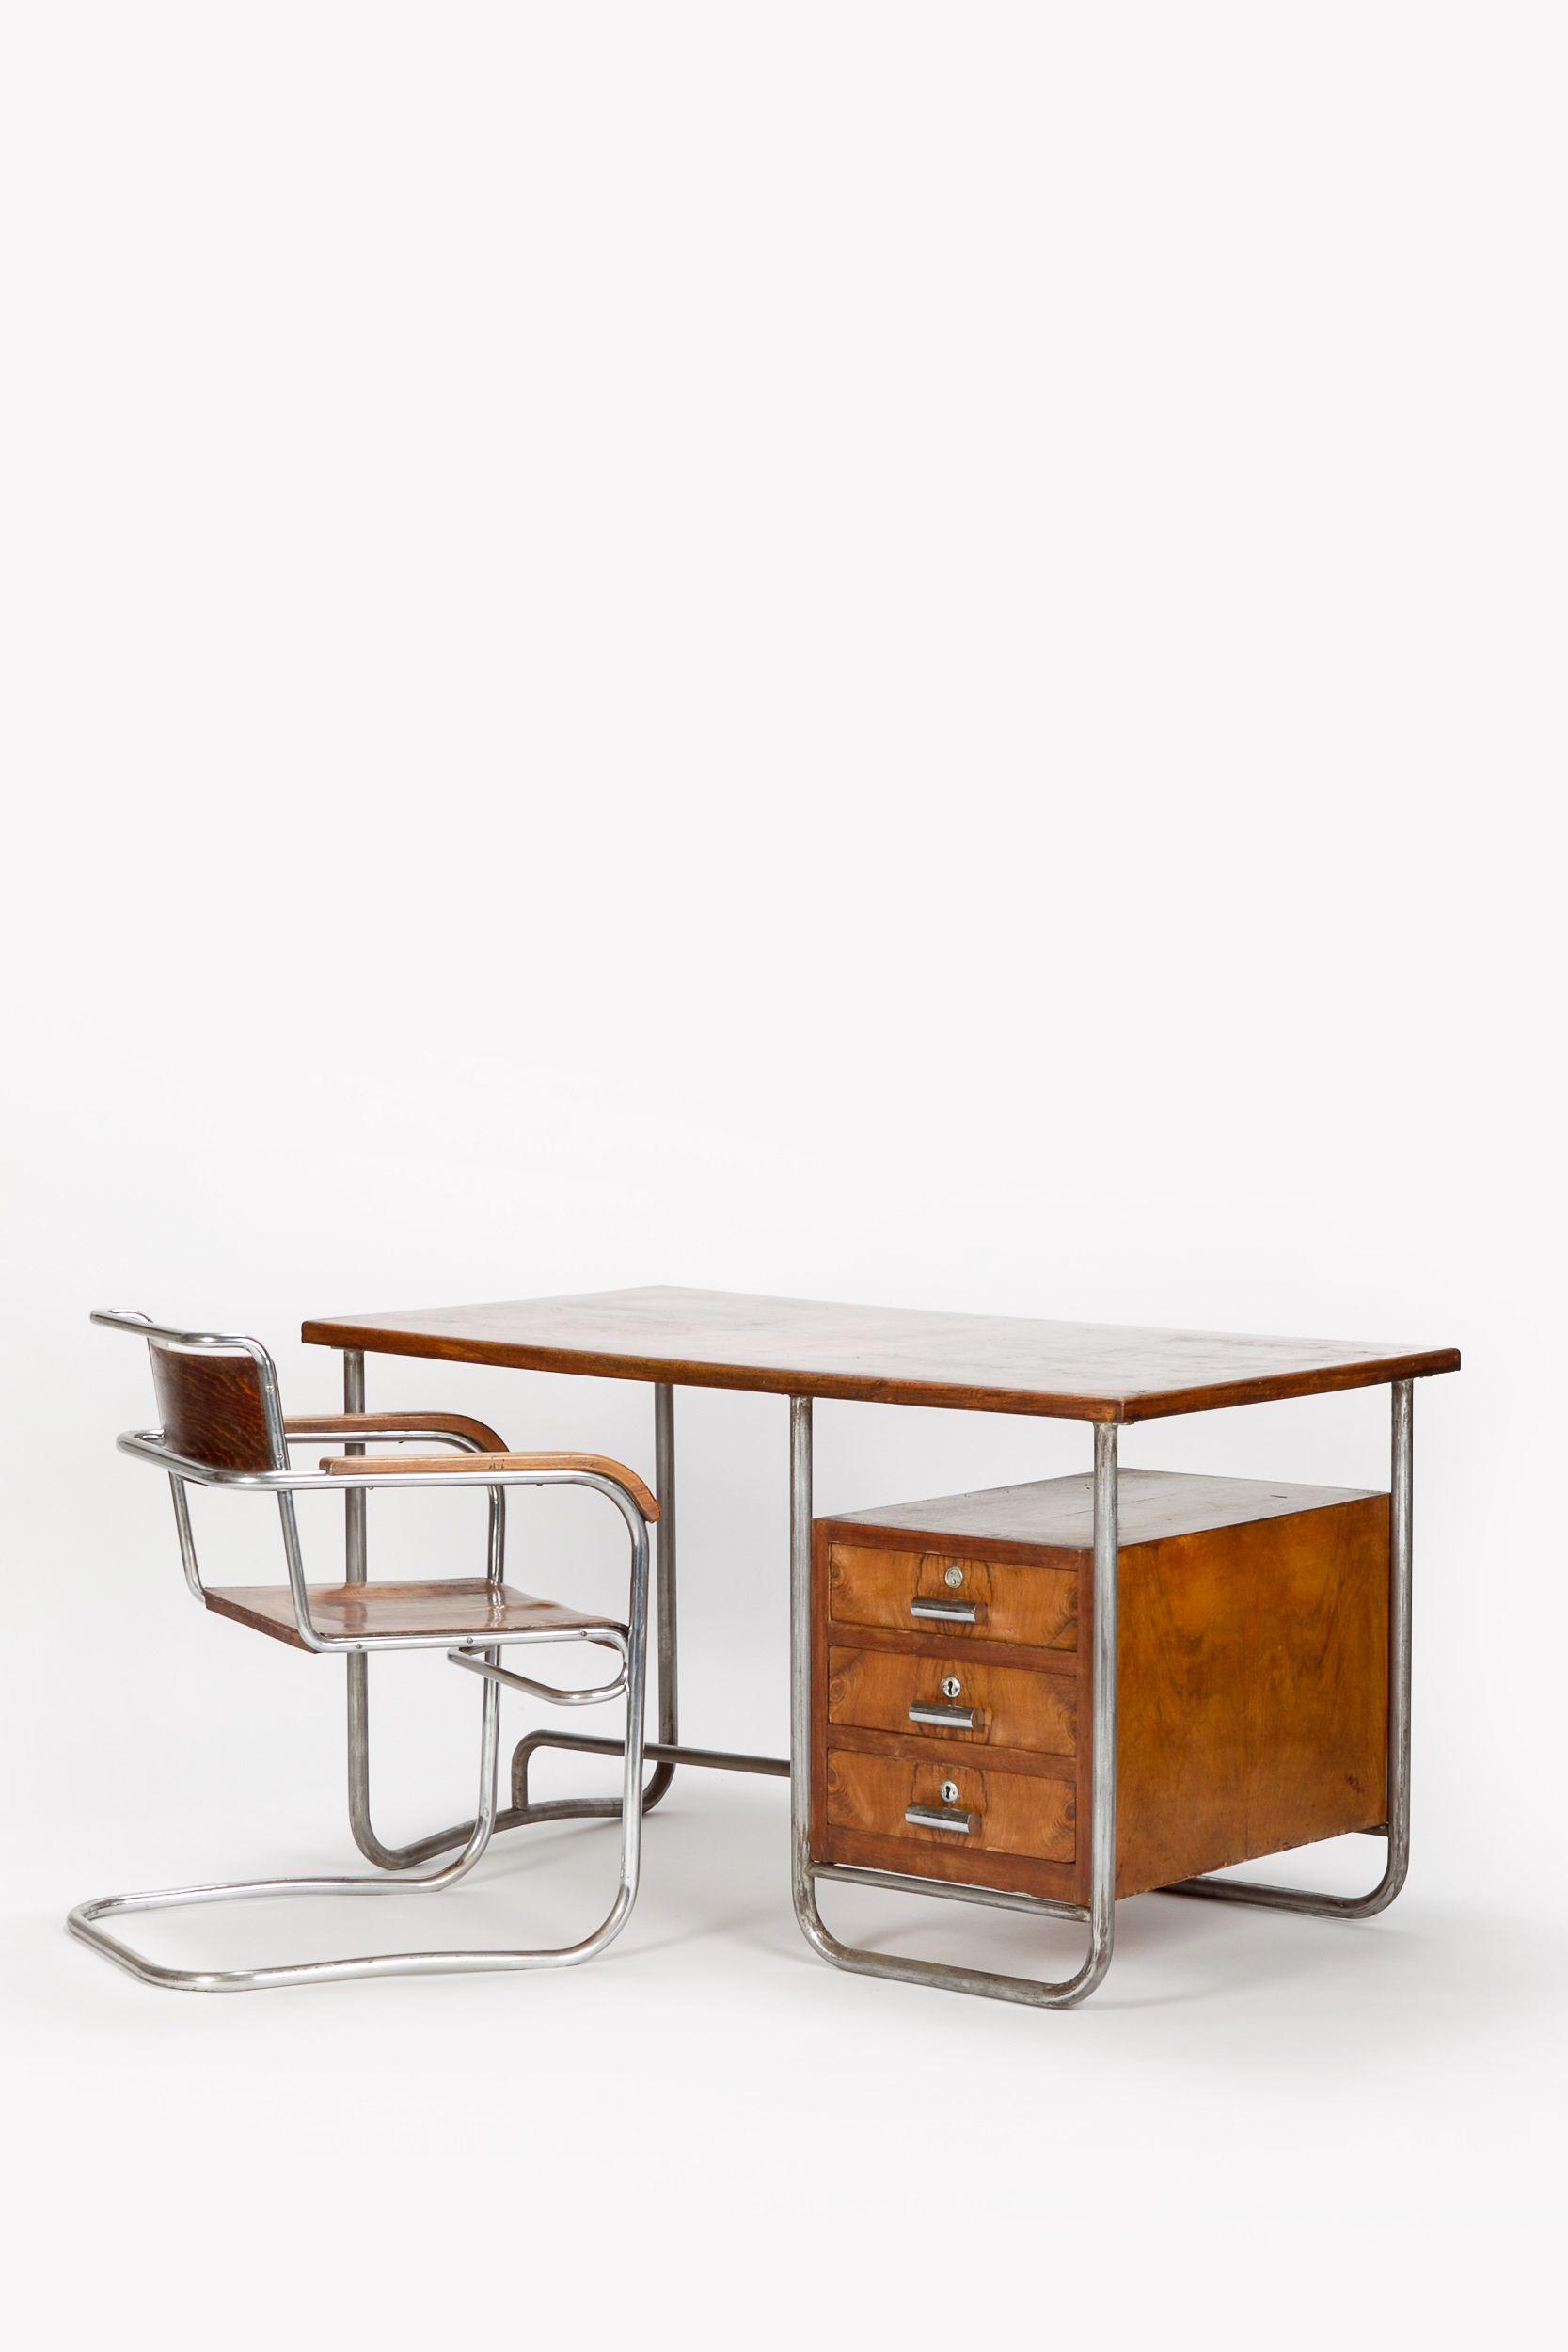 Italian Bauhaus Desk Marcel Breuer 30 S Bauhaus Furniture Modernist Furniture Bauhaus Interior